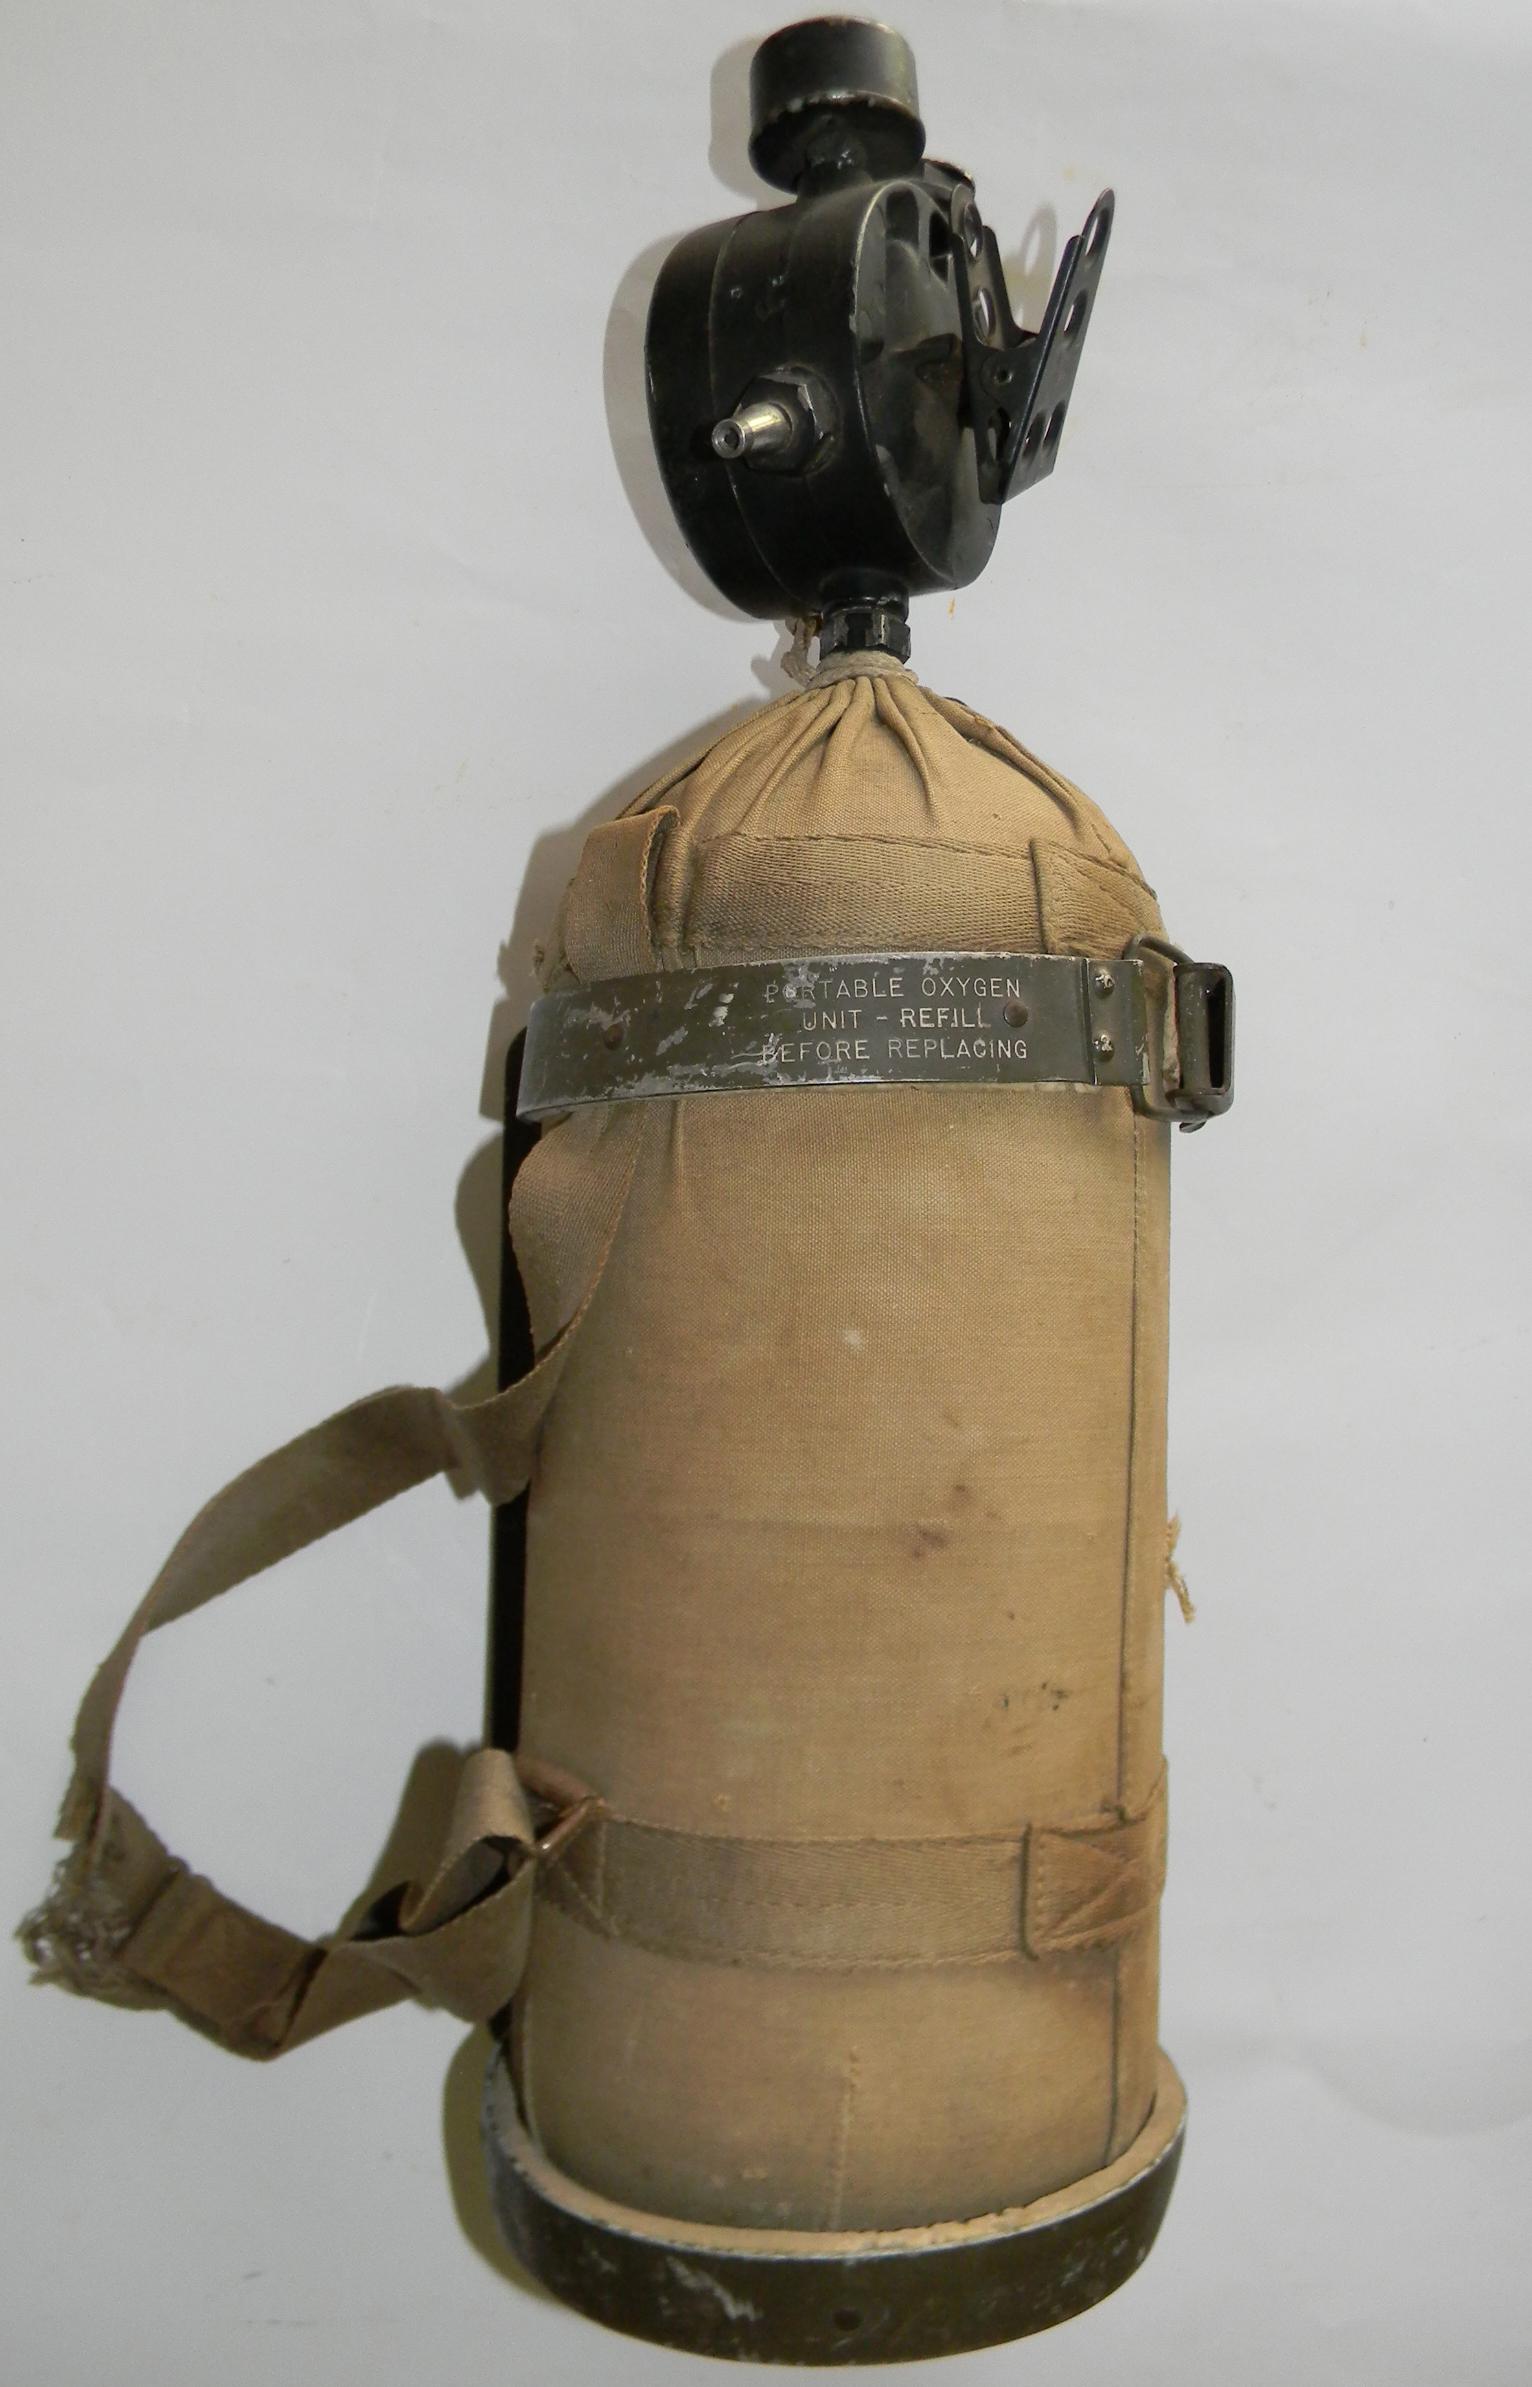 WWII AAF Portable Oxygen Tank